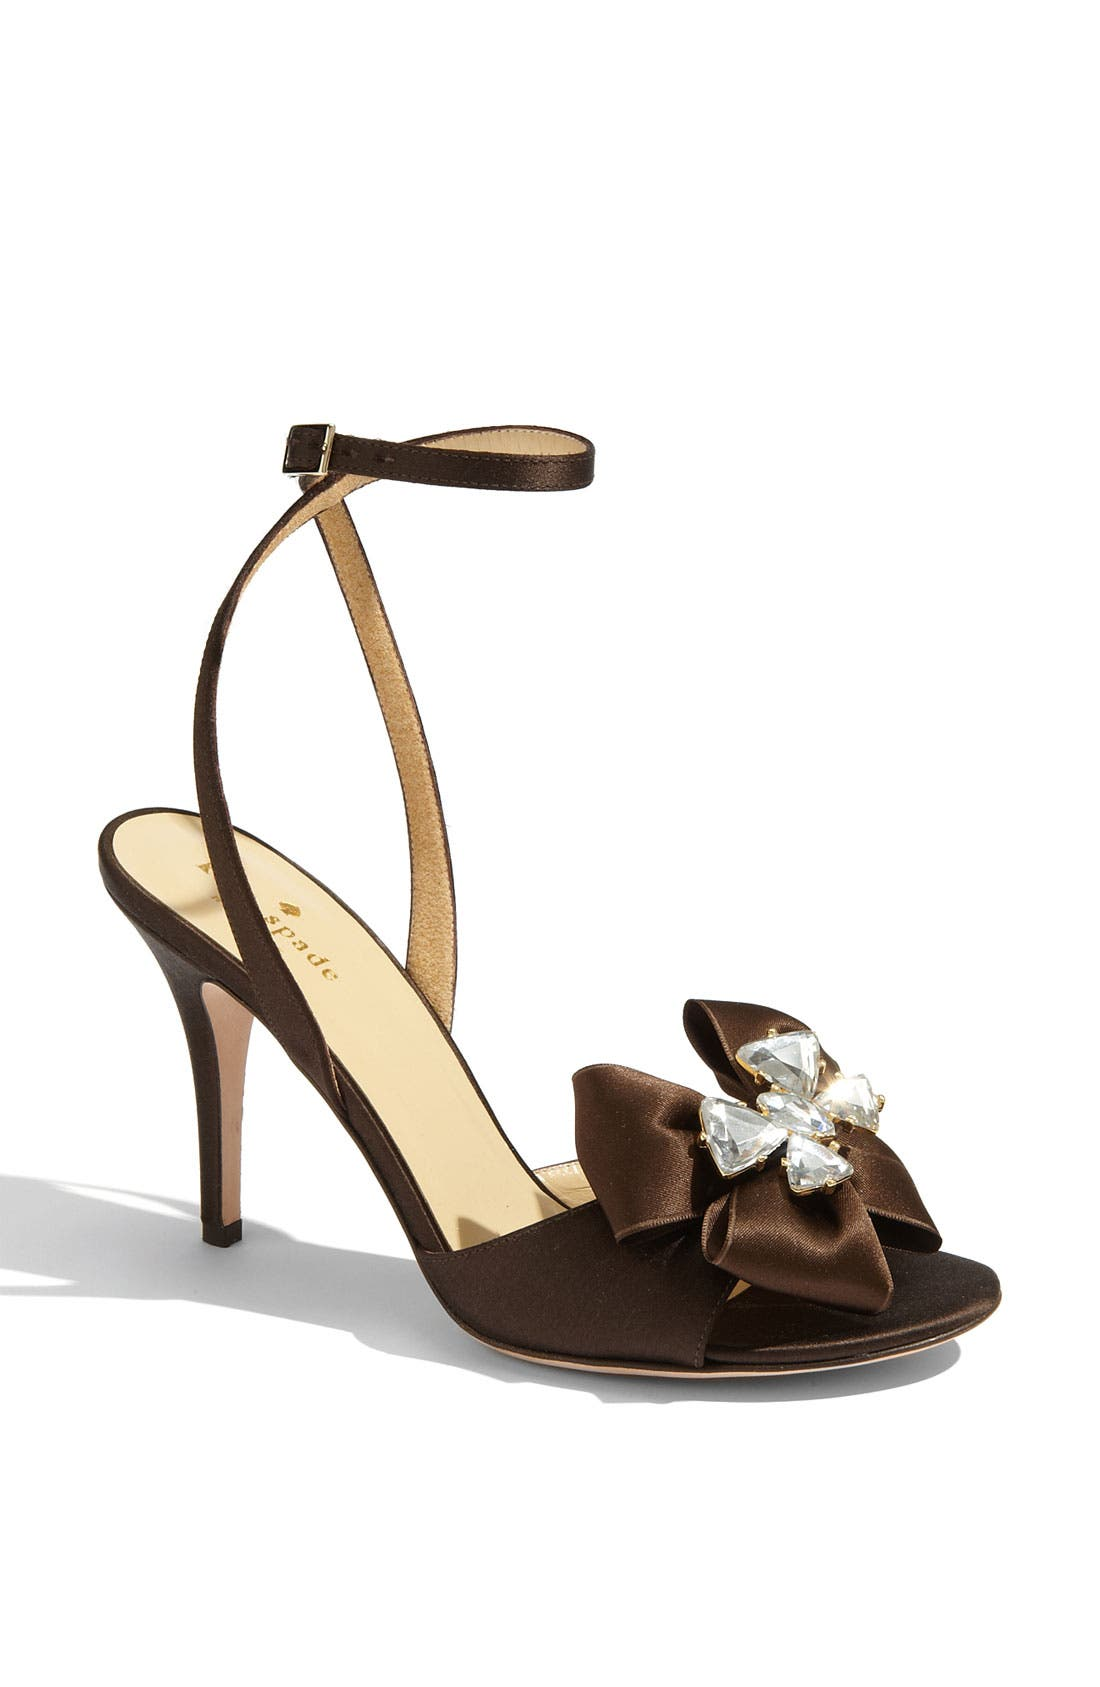 Alternate Image 1 Selected - kate spade new york 'shelby' satin sandal